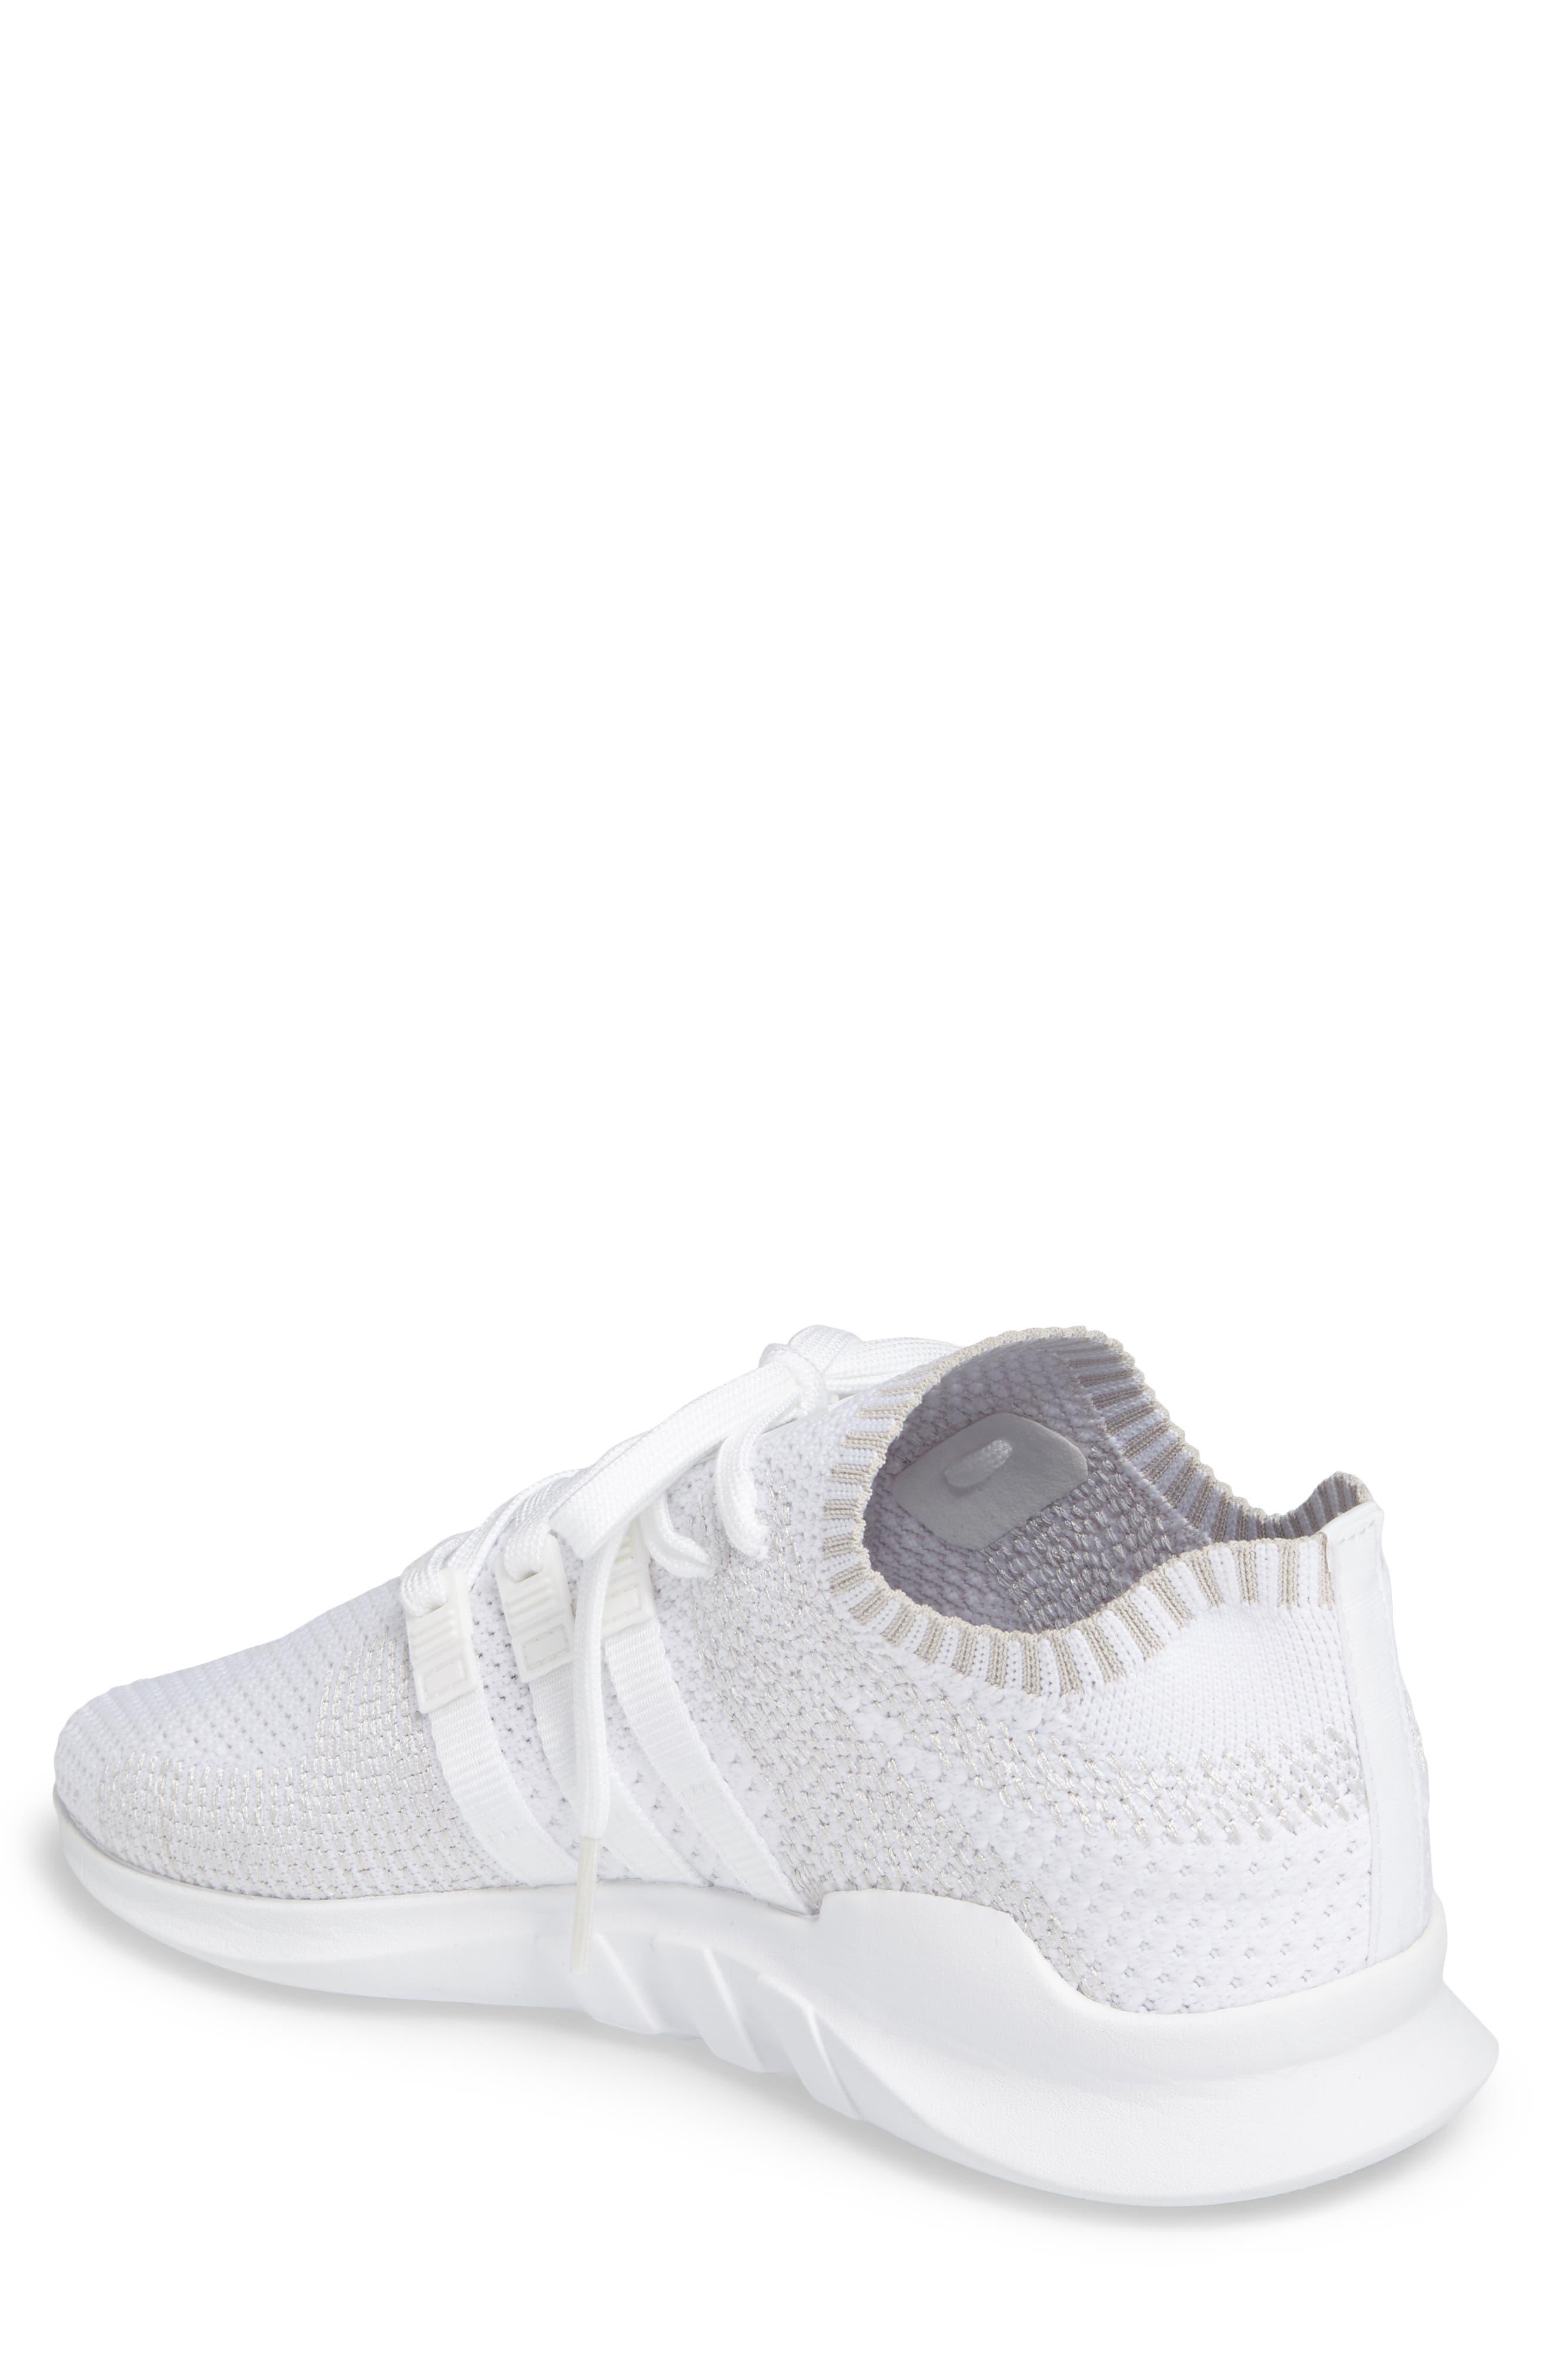 EQT Support ADV PrimeKnit Sneaker,                             Alternate thumbnail 2, color,                             White/ White/ Sub Green